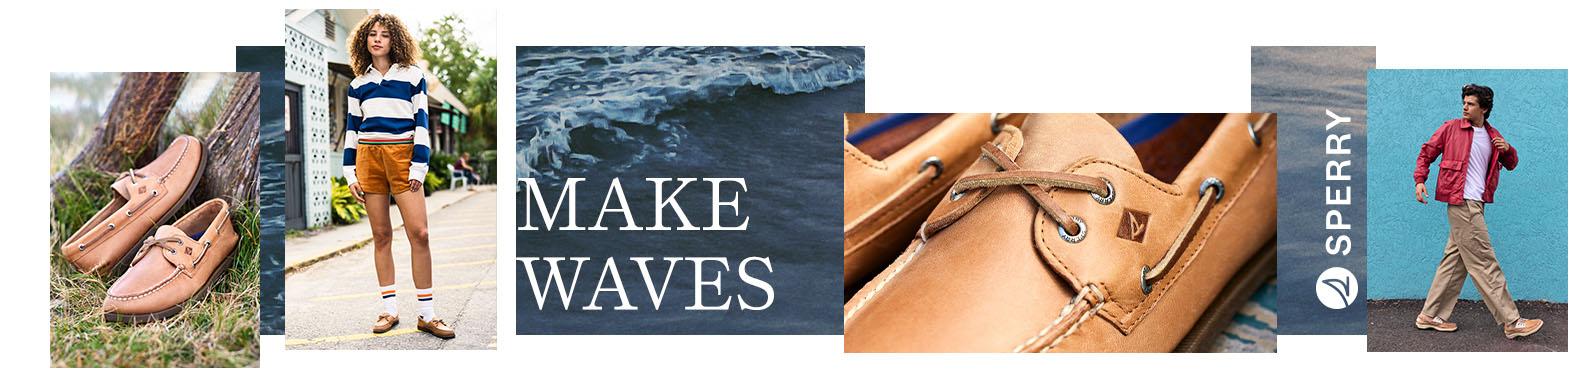 Sperry Top-Sider brand header image